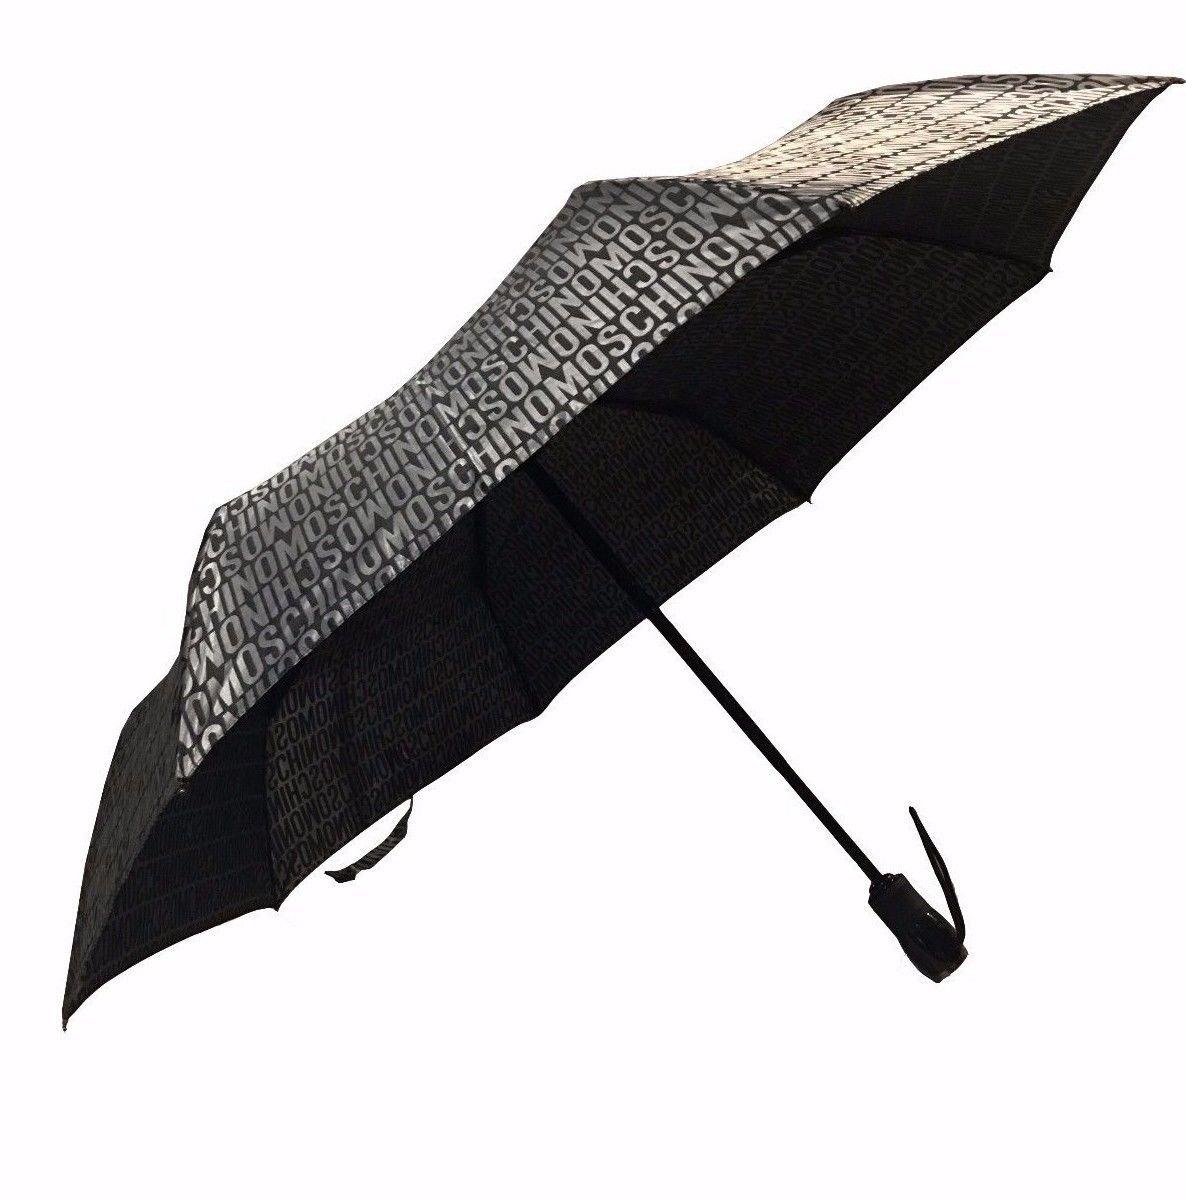 Paraguas Moschino compacto/retráctil Silver Multilogo as17mo10: Amazon.es: Equipaje